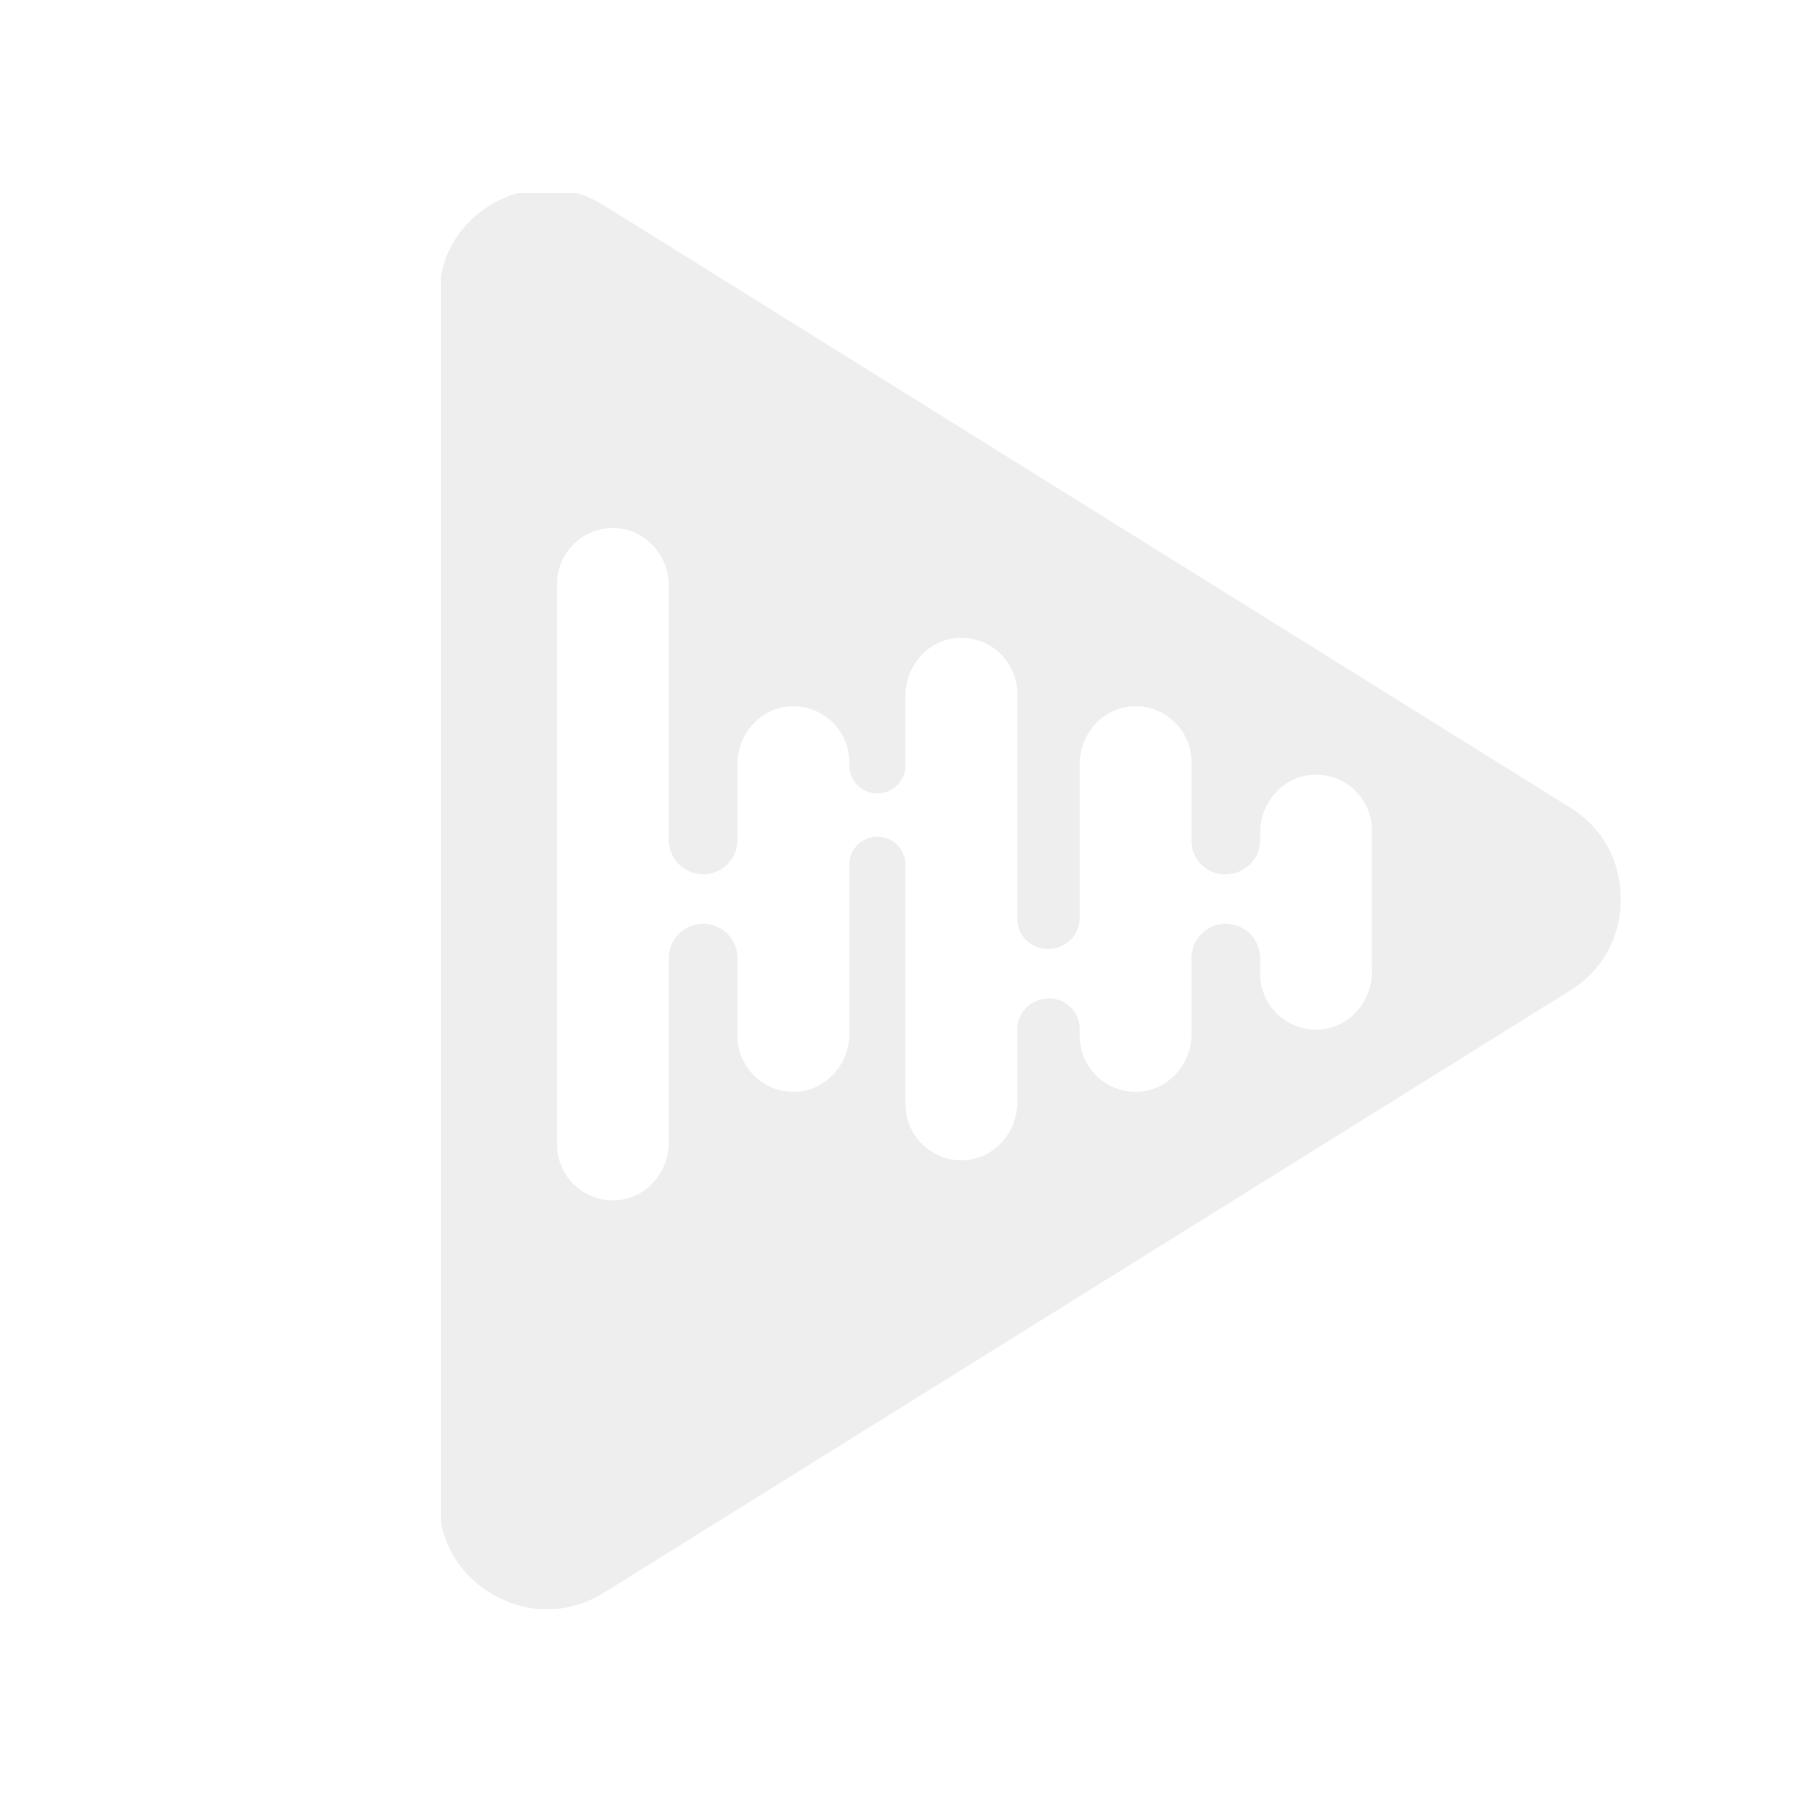 Hertz SPL Show SV 200.1 - STK DEMO